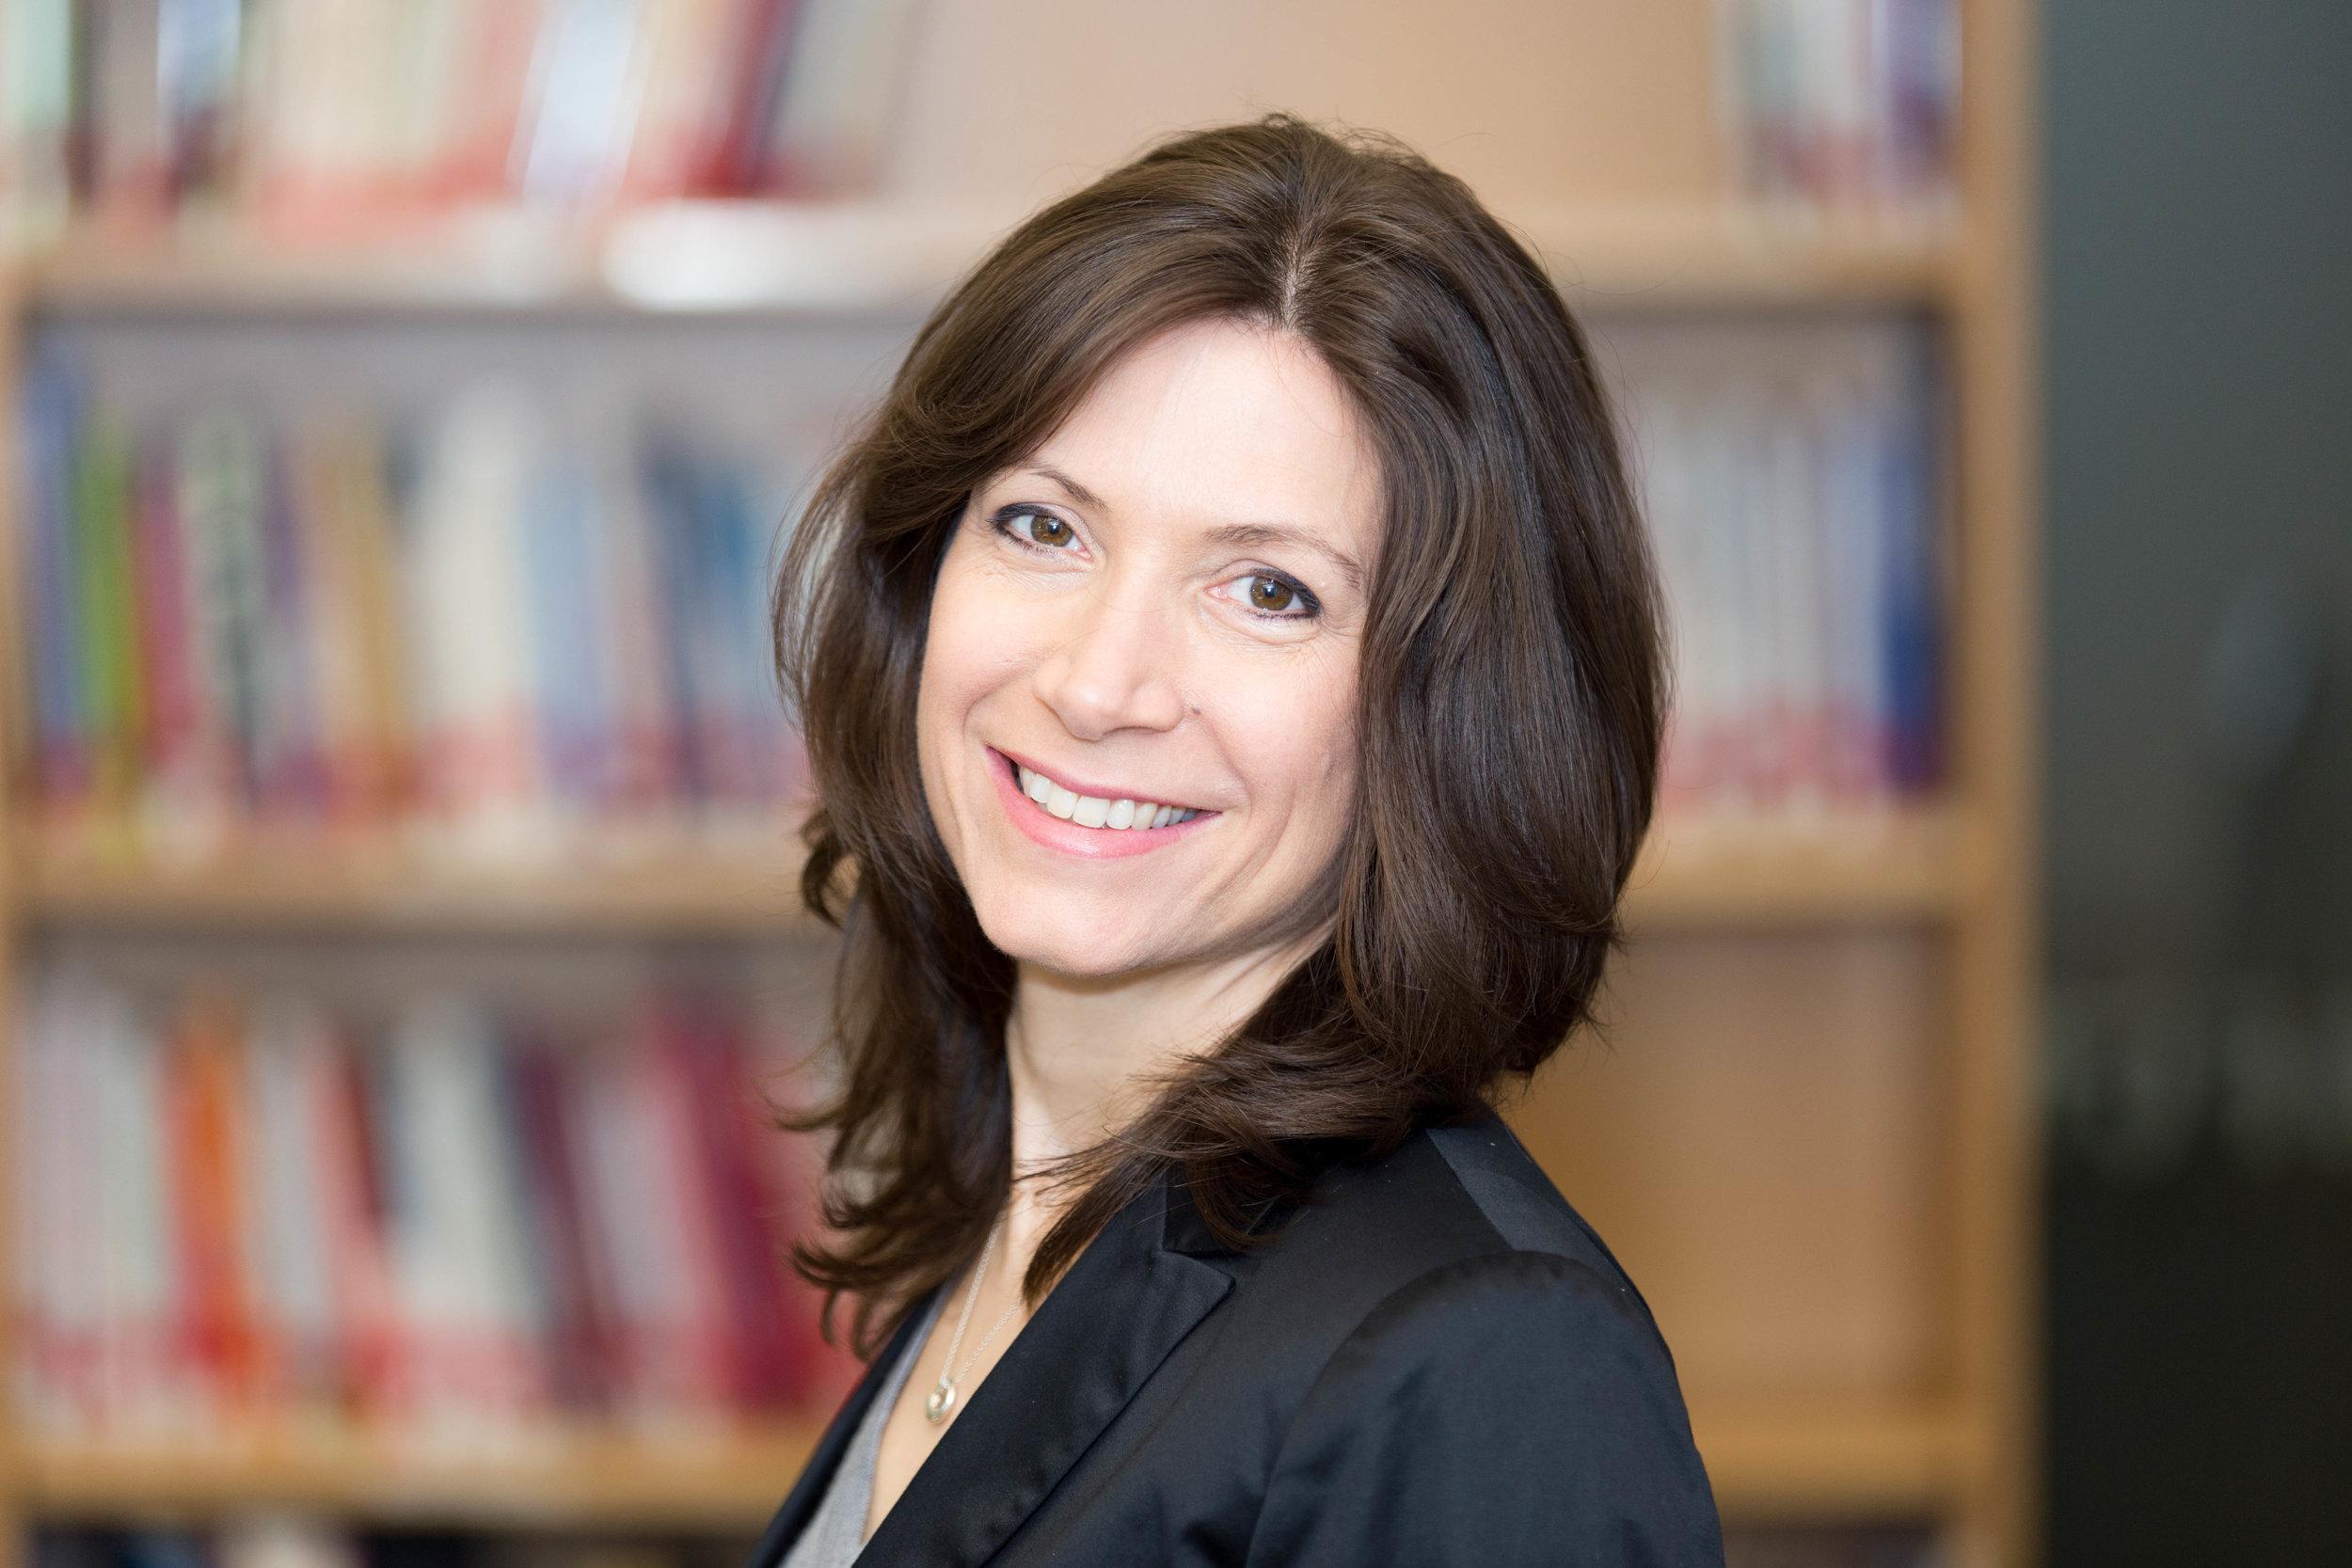 Dr. Kimberly Wintemute